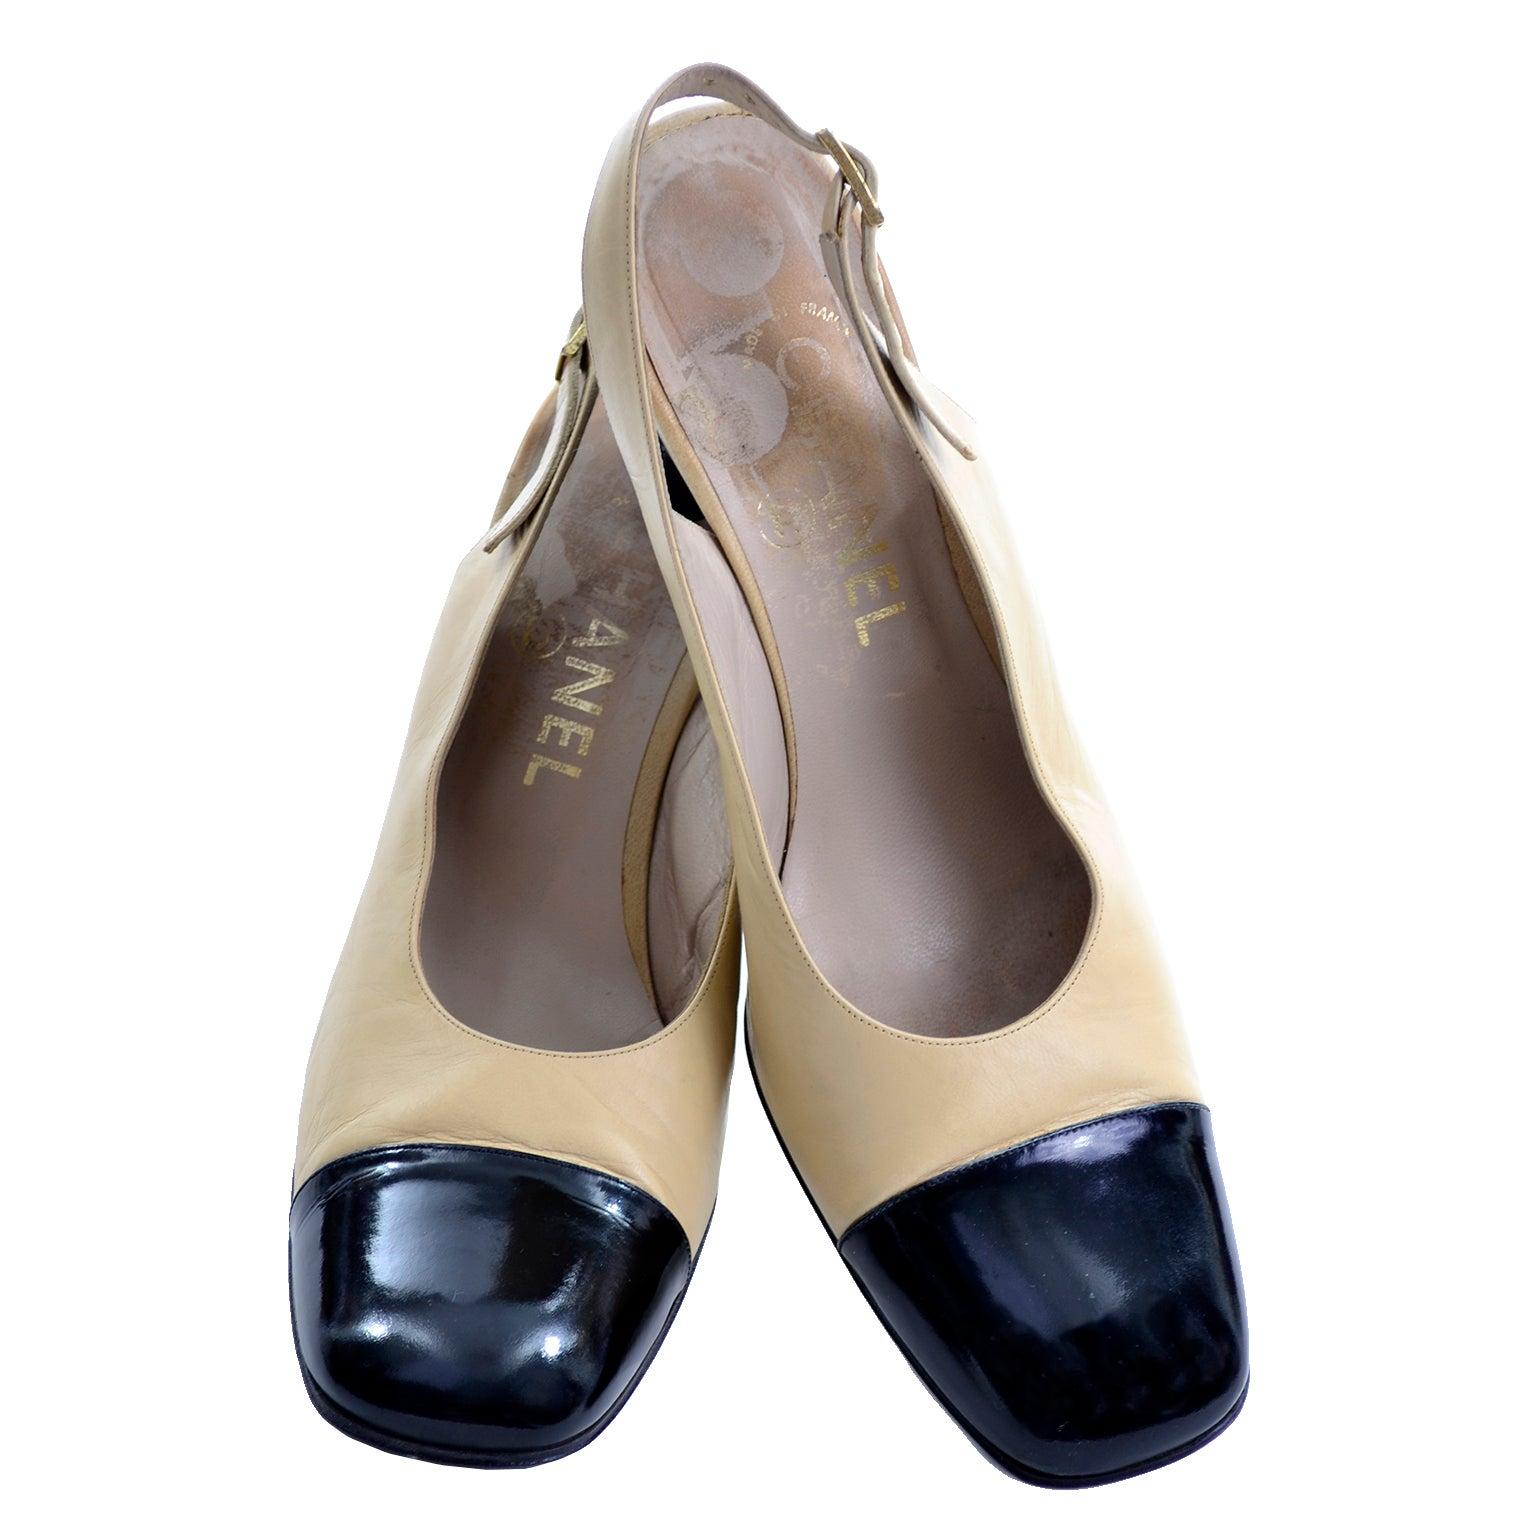 ed89b2cf7 Chanel Vintage Cream and Black Slingback Block Heel Shoes 39.5 at 1stdibs